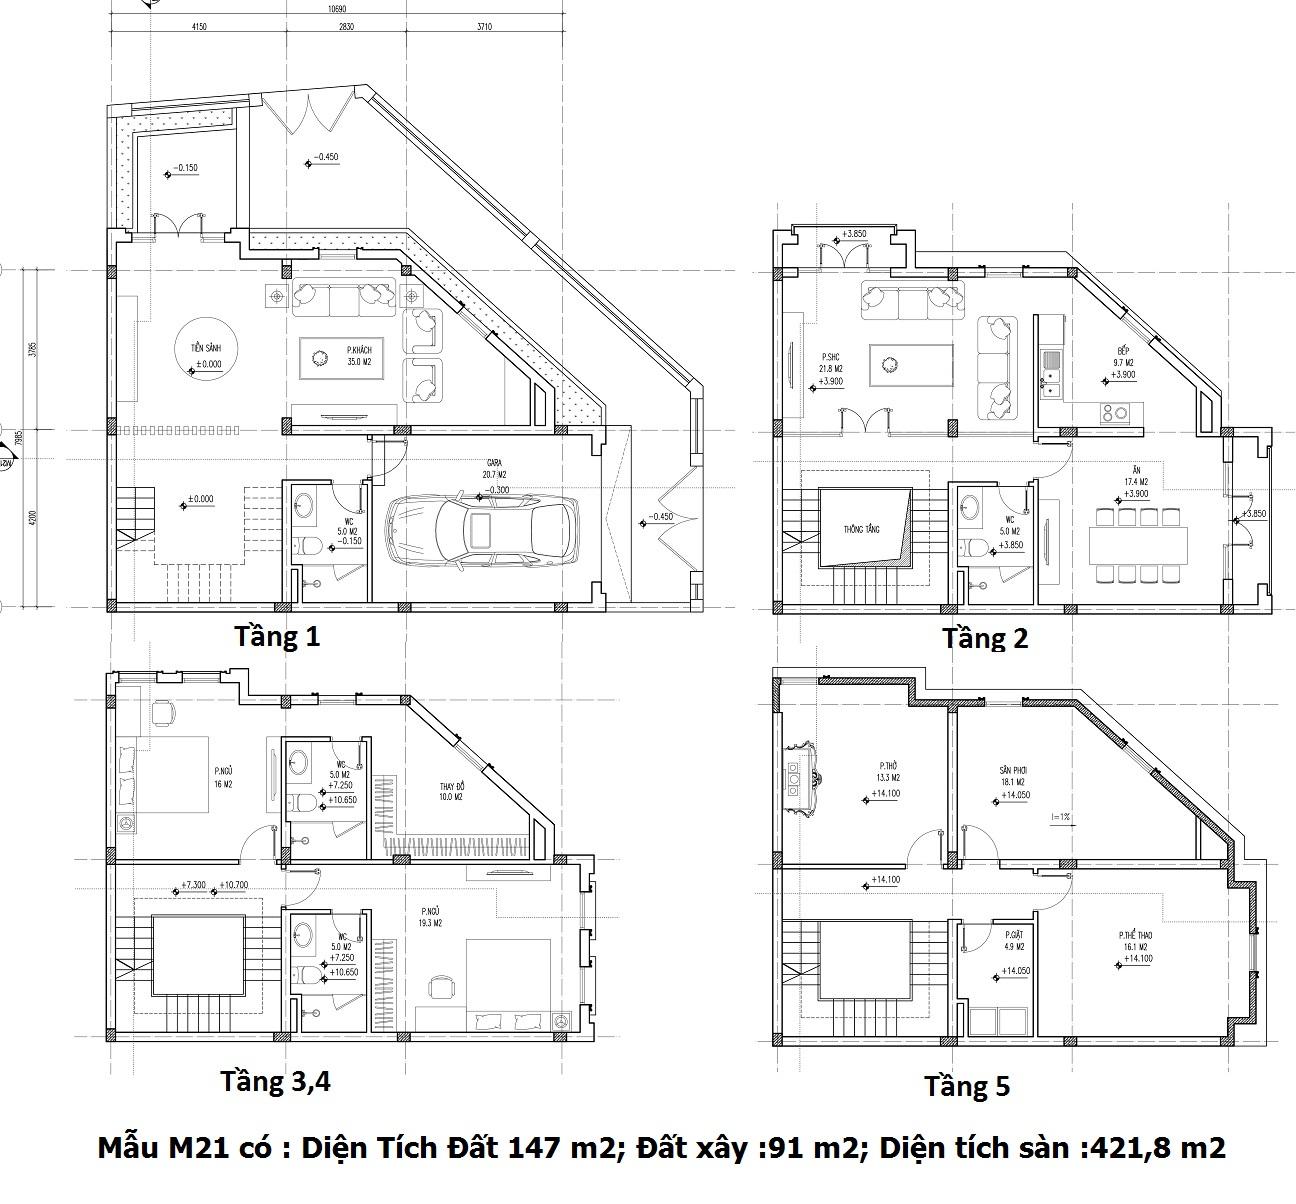 Mẫu thiết kế M21